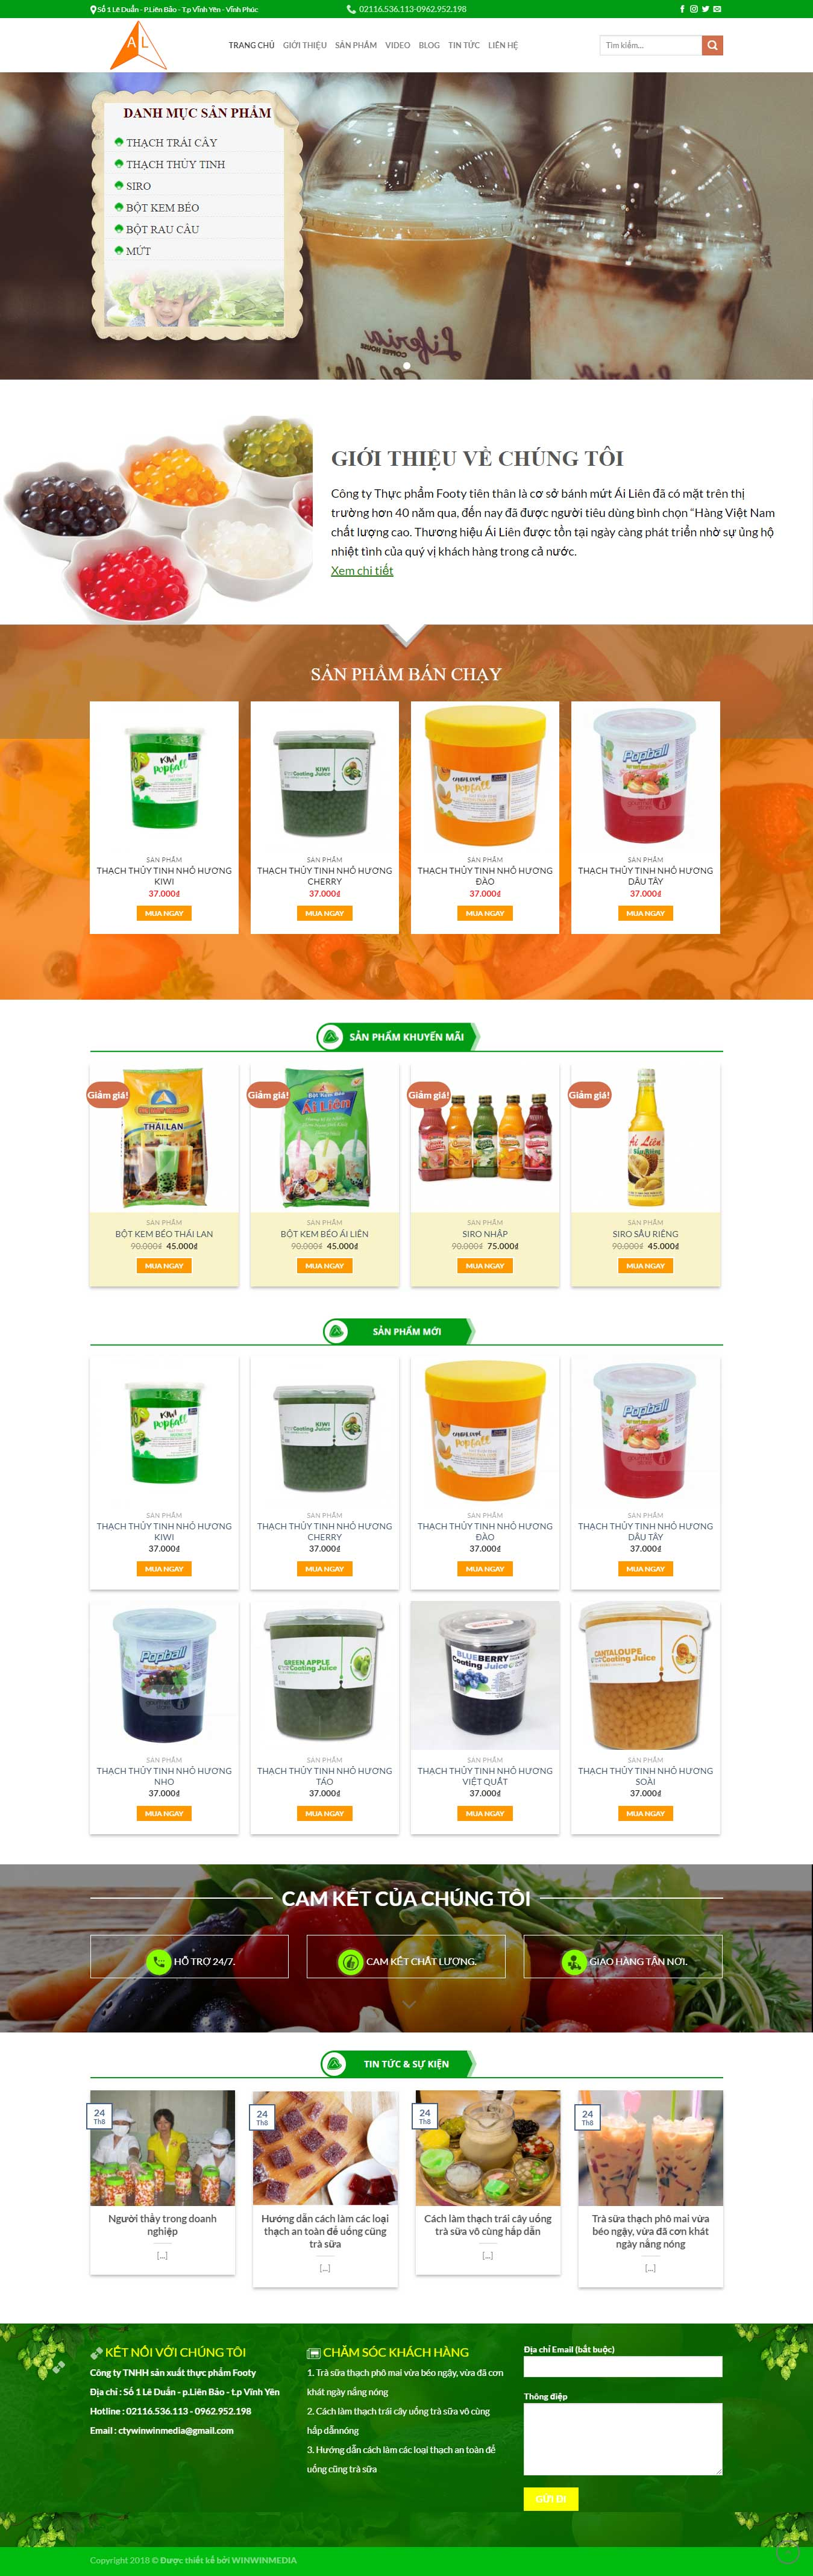 Mẫu website bán trà sữa